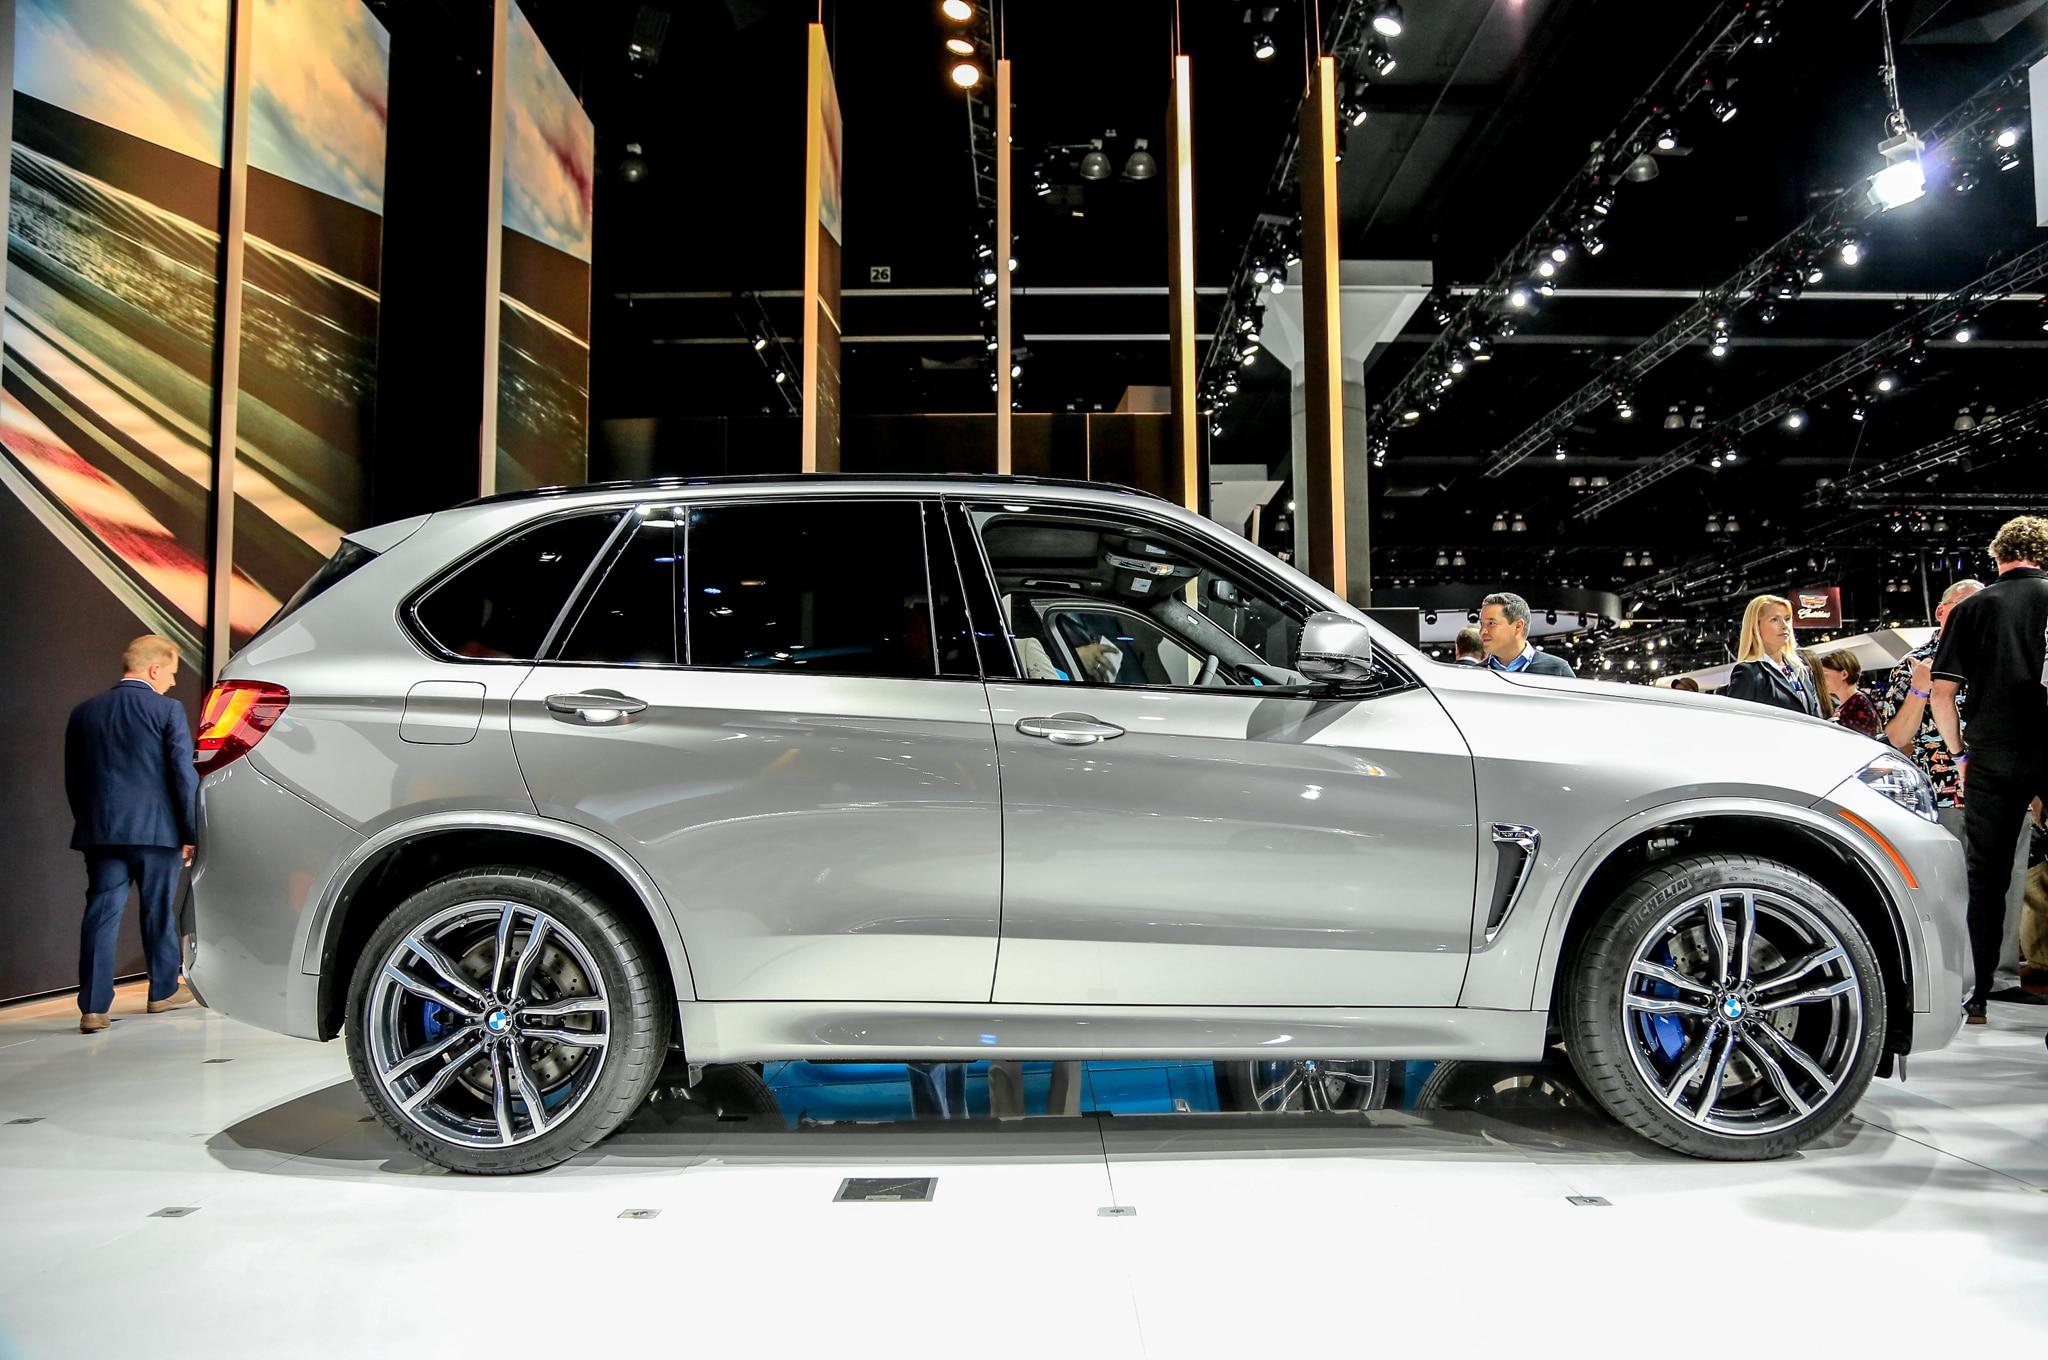 2015 BMW X5 M Side Profile